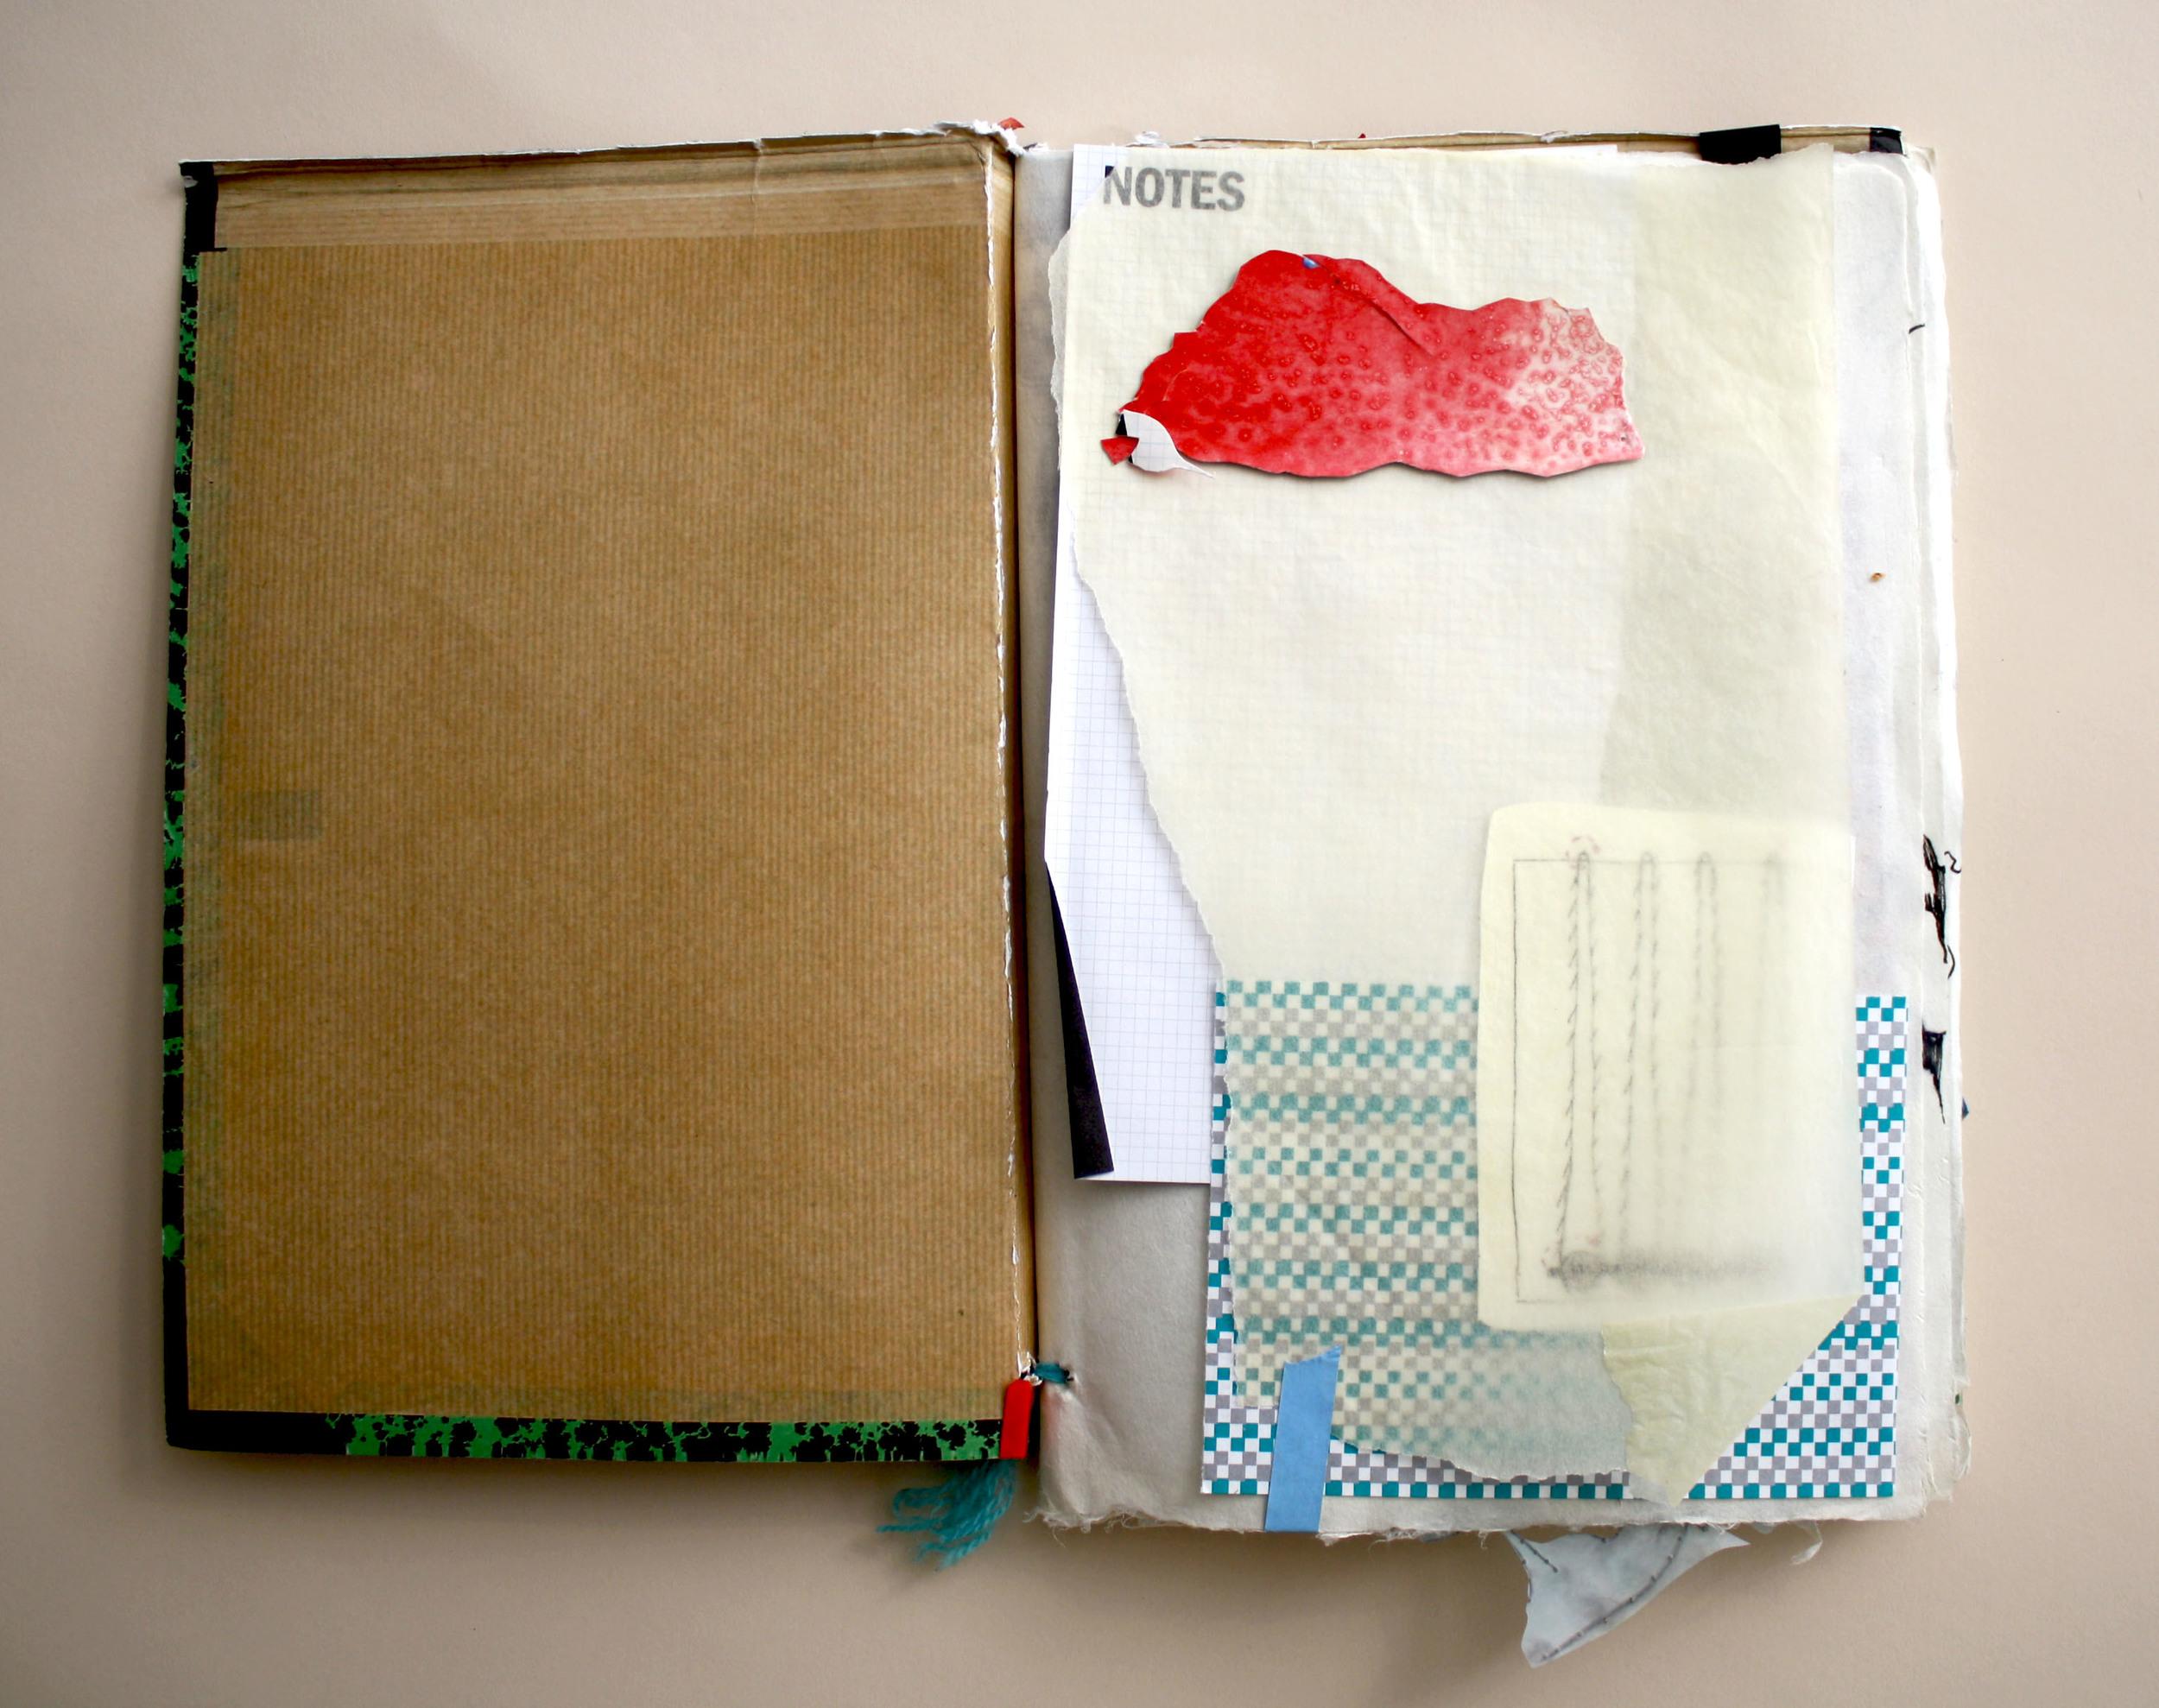 page 1: spilled paint cloud, old schematics